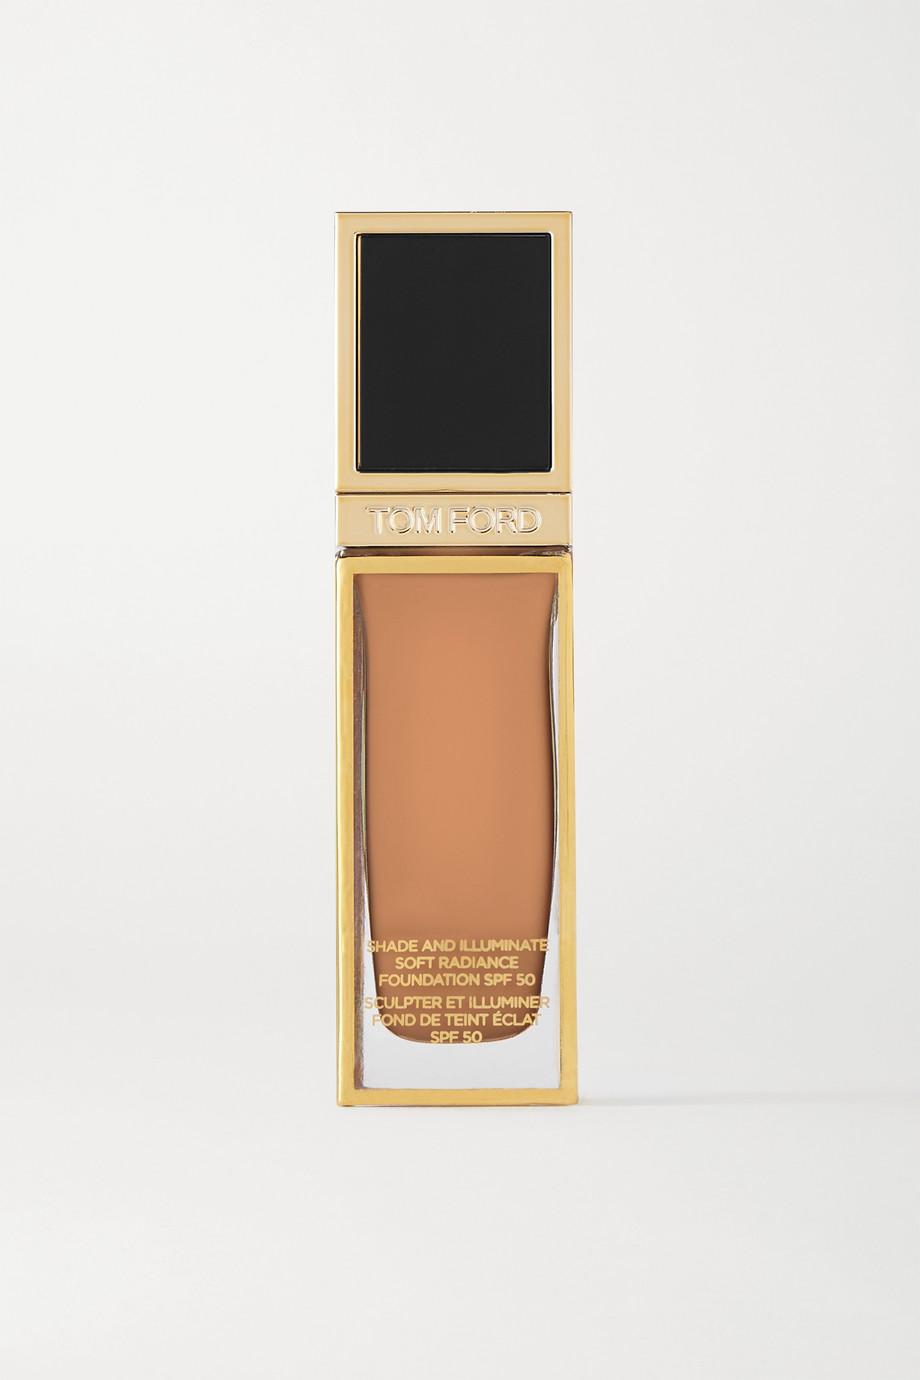 TOM FORD BEAUTY Shade and Illuminate Soft Radiance Foundation SPF50 - 7.7 Honey, 30ml